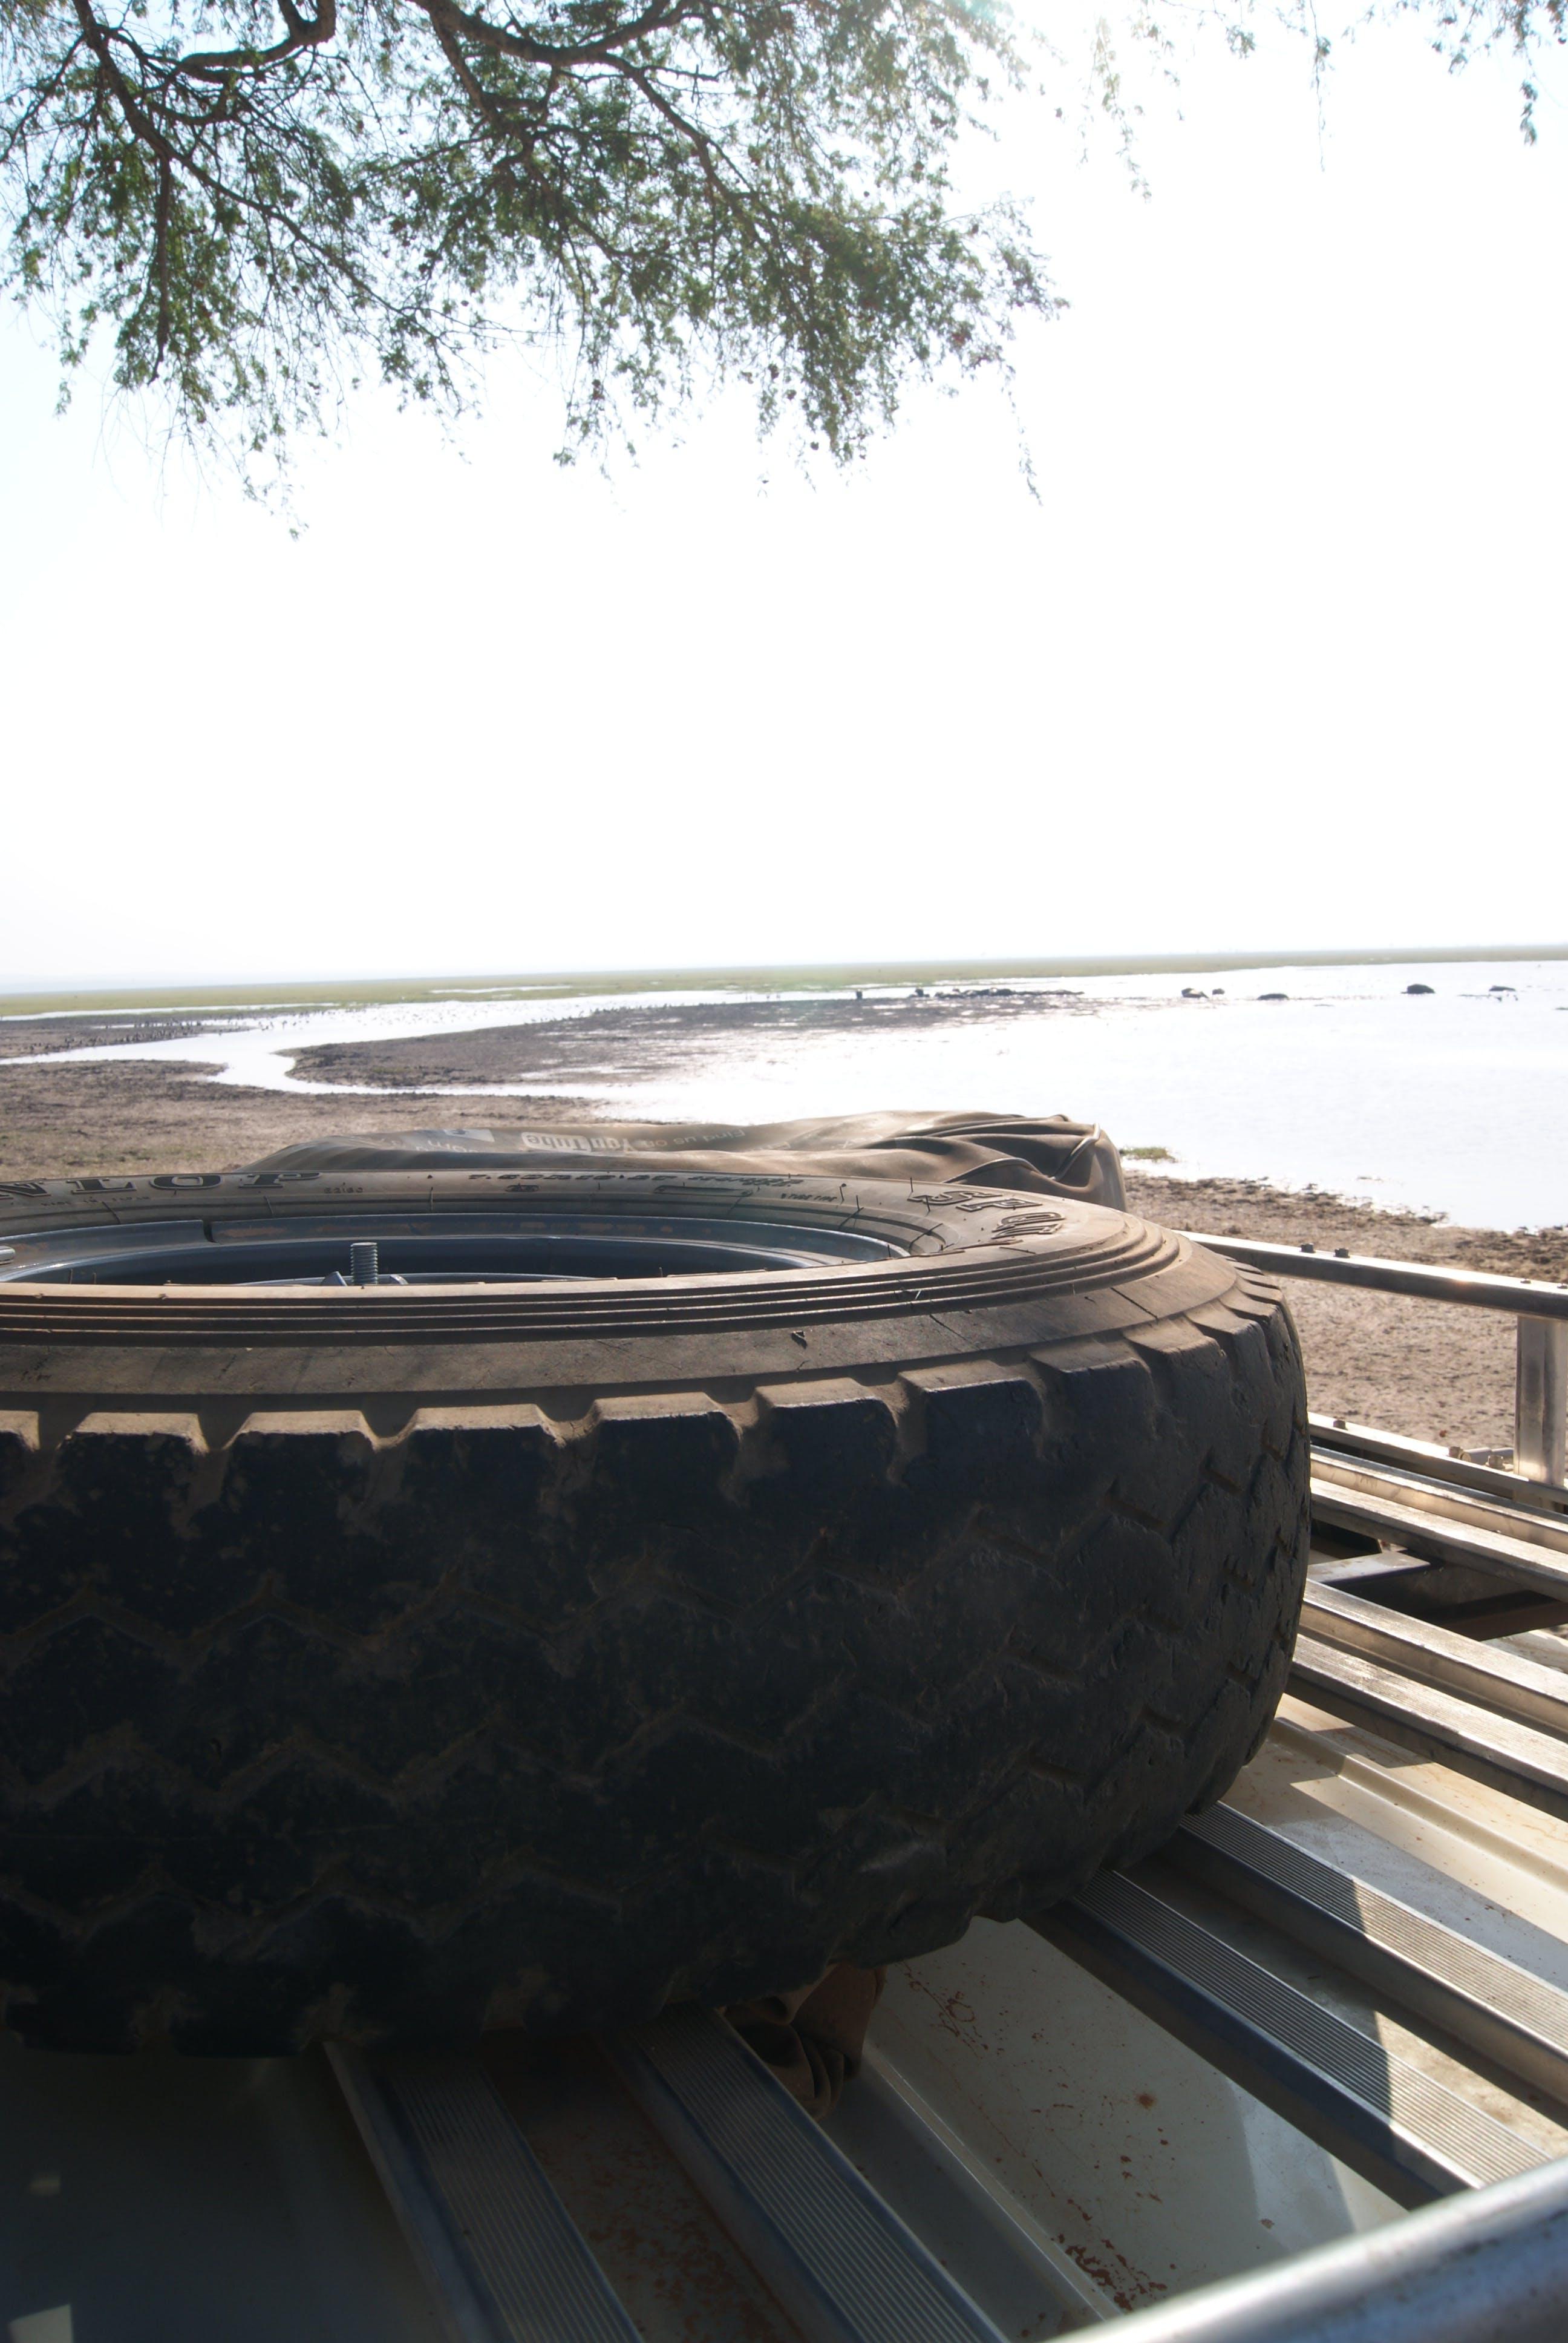 Free stock photo of car, lake, rooftop, safari